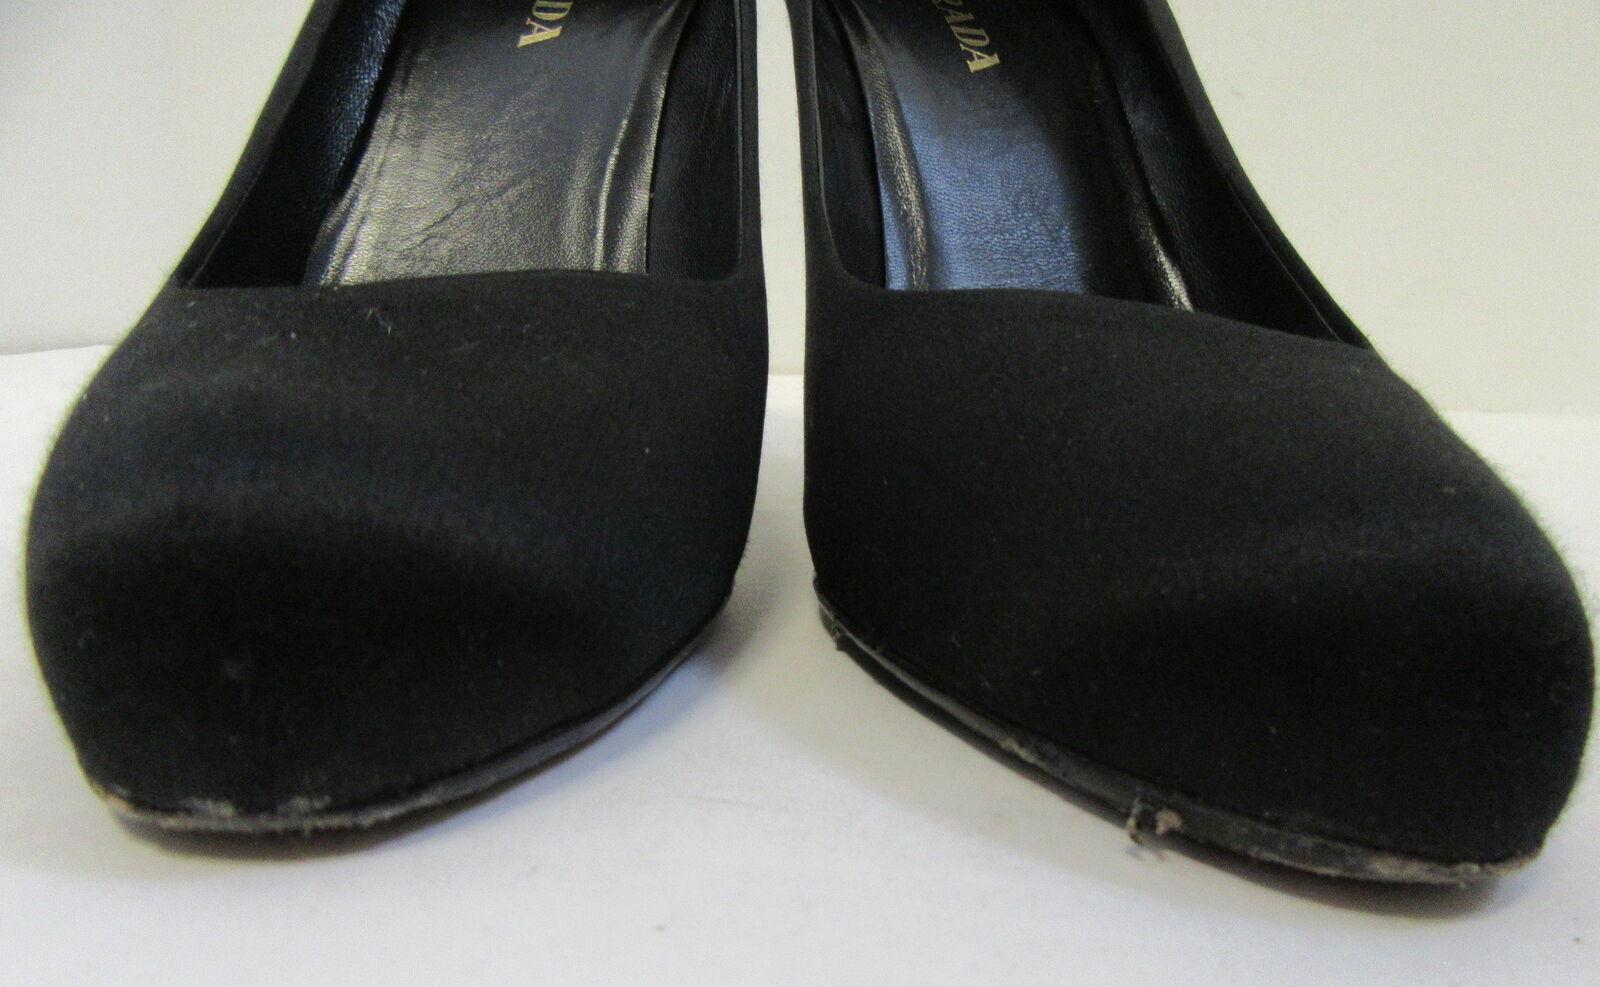 PRADA Black Satin Pumps Size 40 40 40 add676